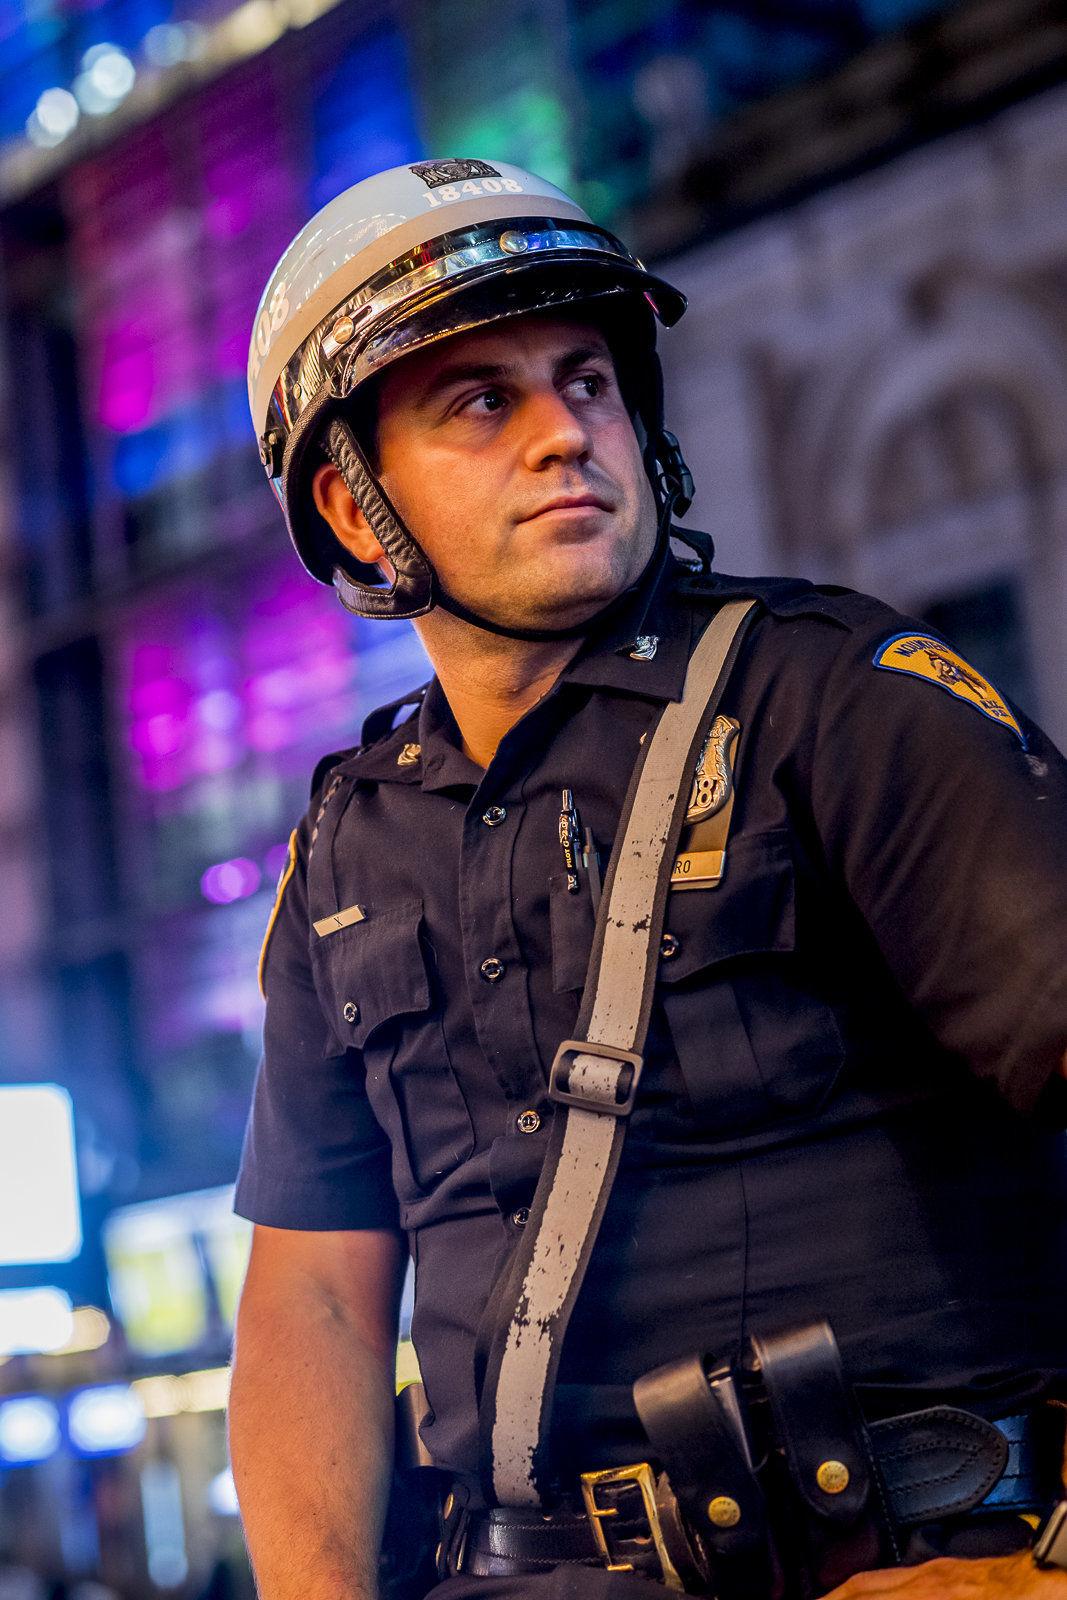 Mounted NYC Police